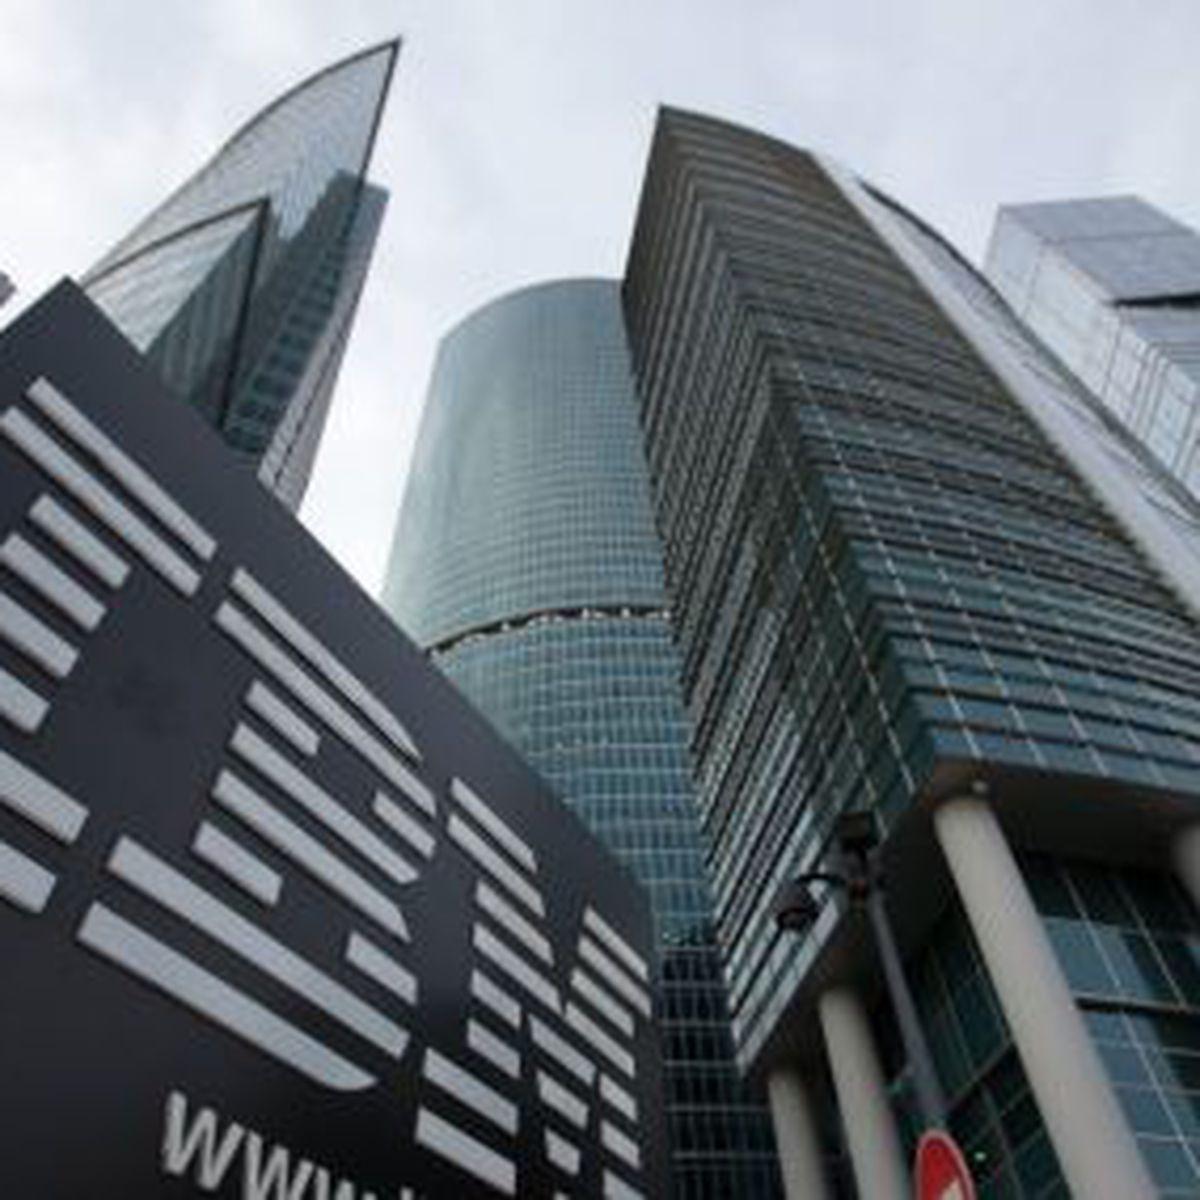 IBM เทพนักงานในยุโรป 10,000 คน หลังเบนเป้าโฟกัส Cloud มากขึ้น